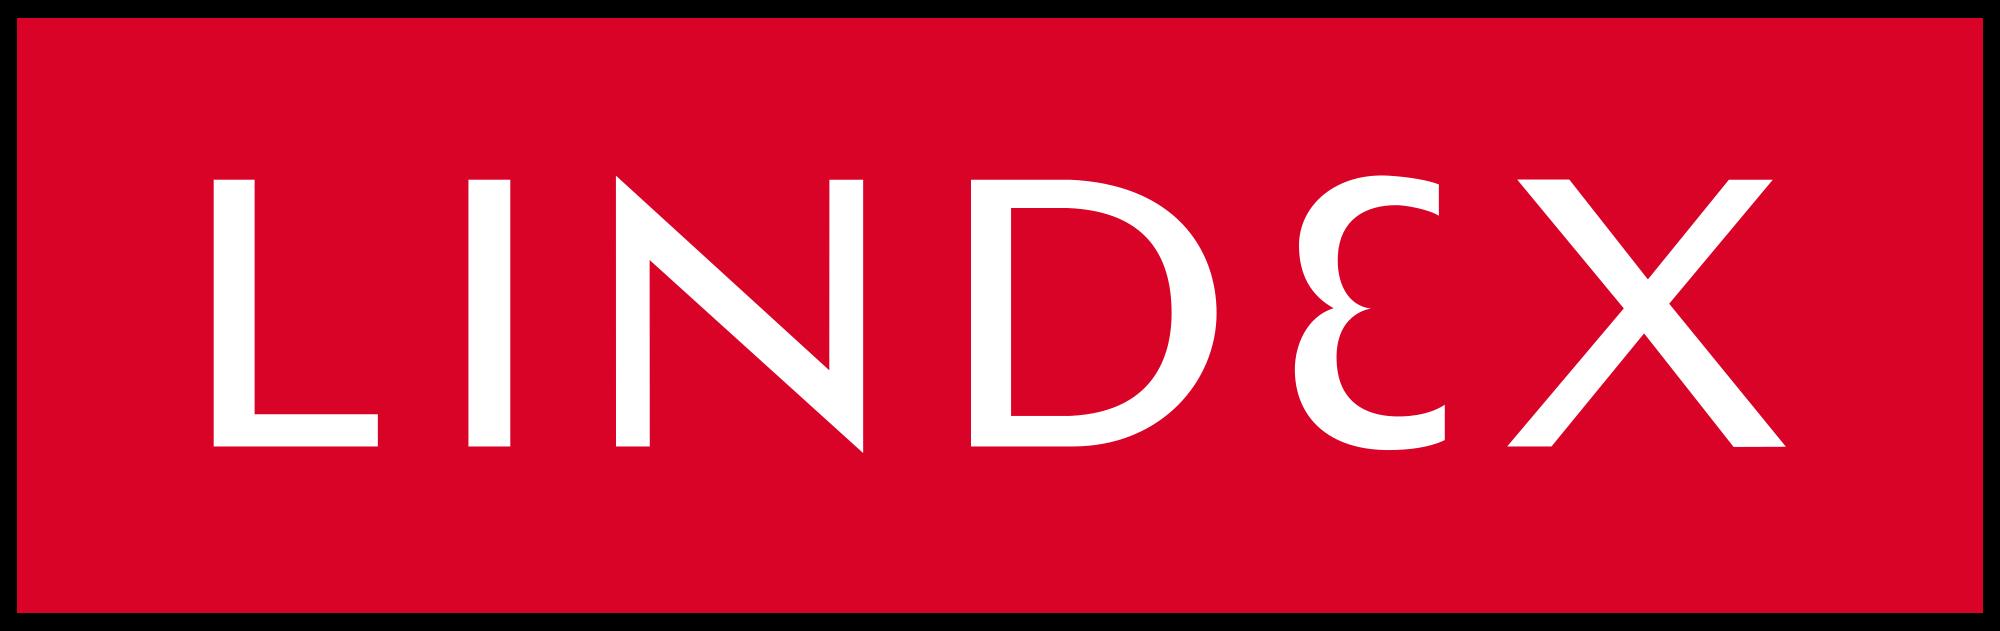 Lindex logo